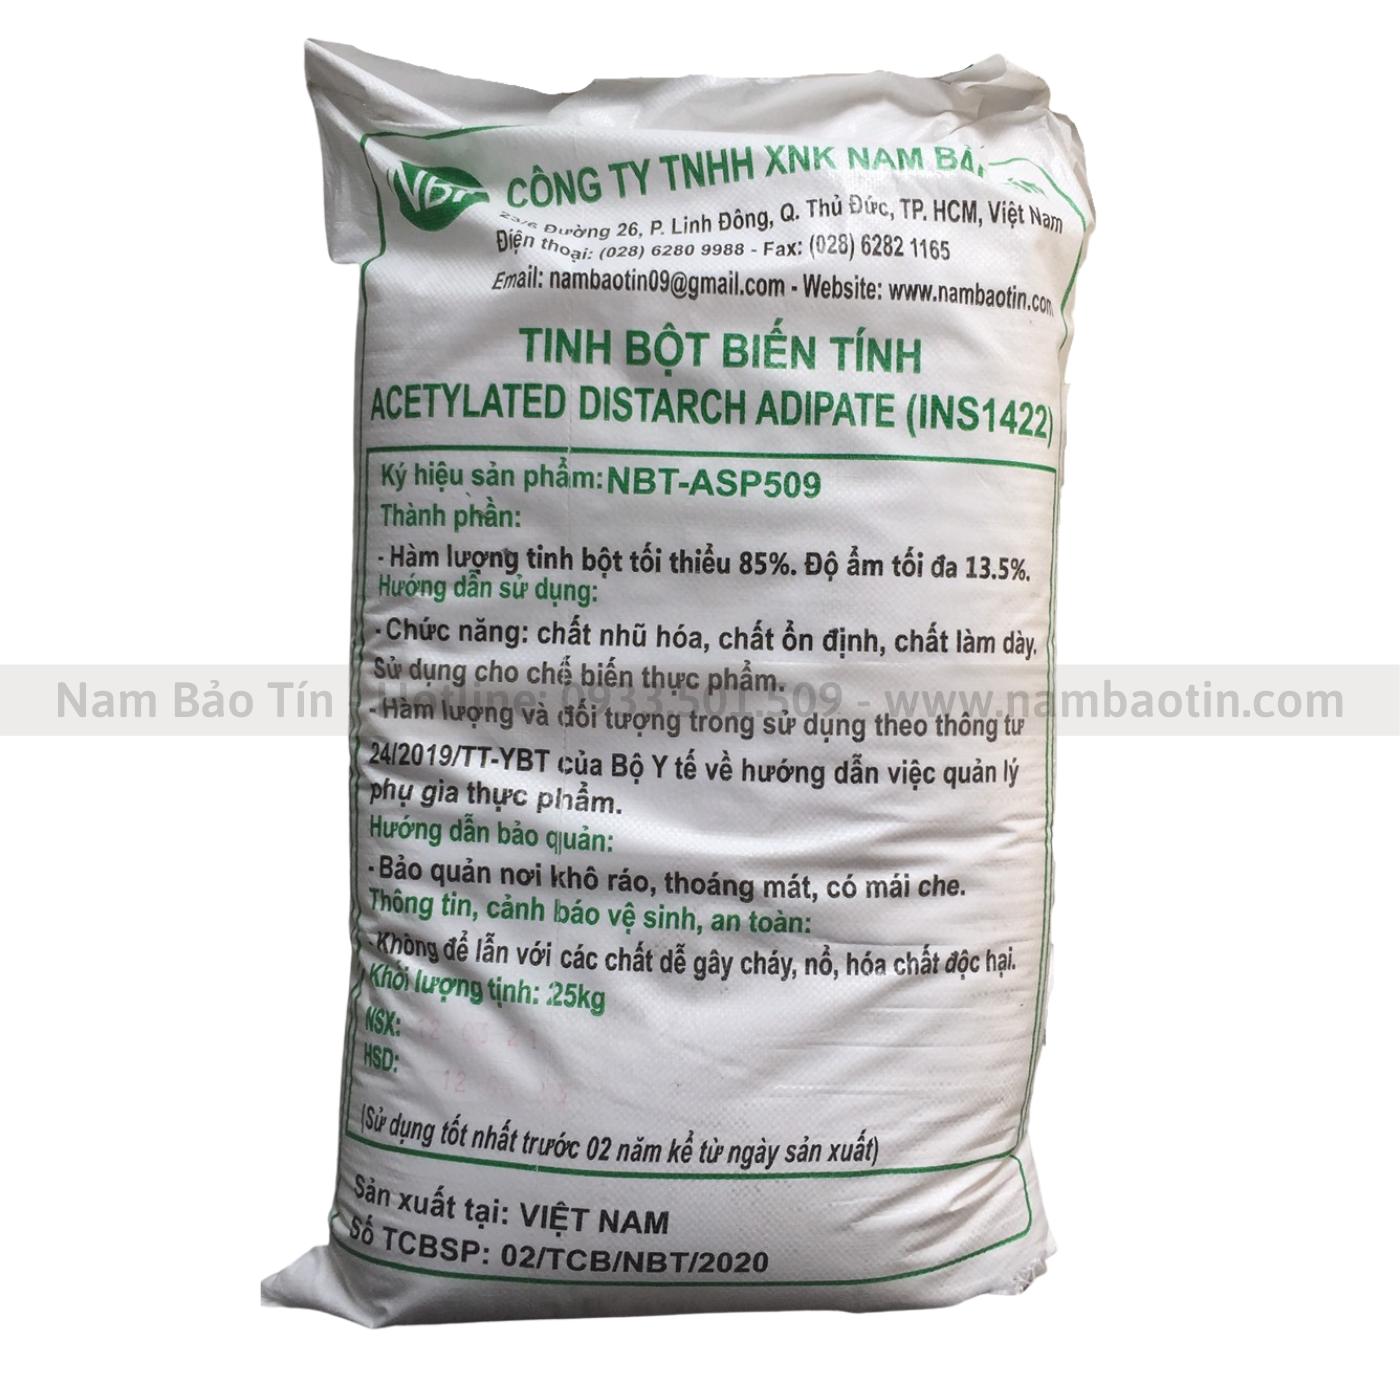 Tinh bột biến tính Acetylated Distarch Adipate INS1422